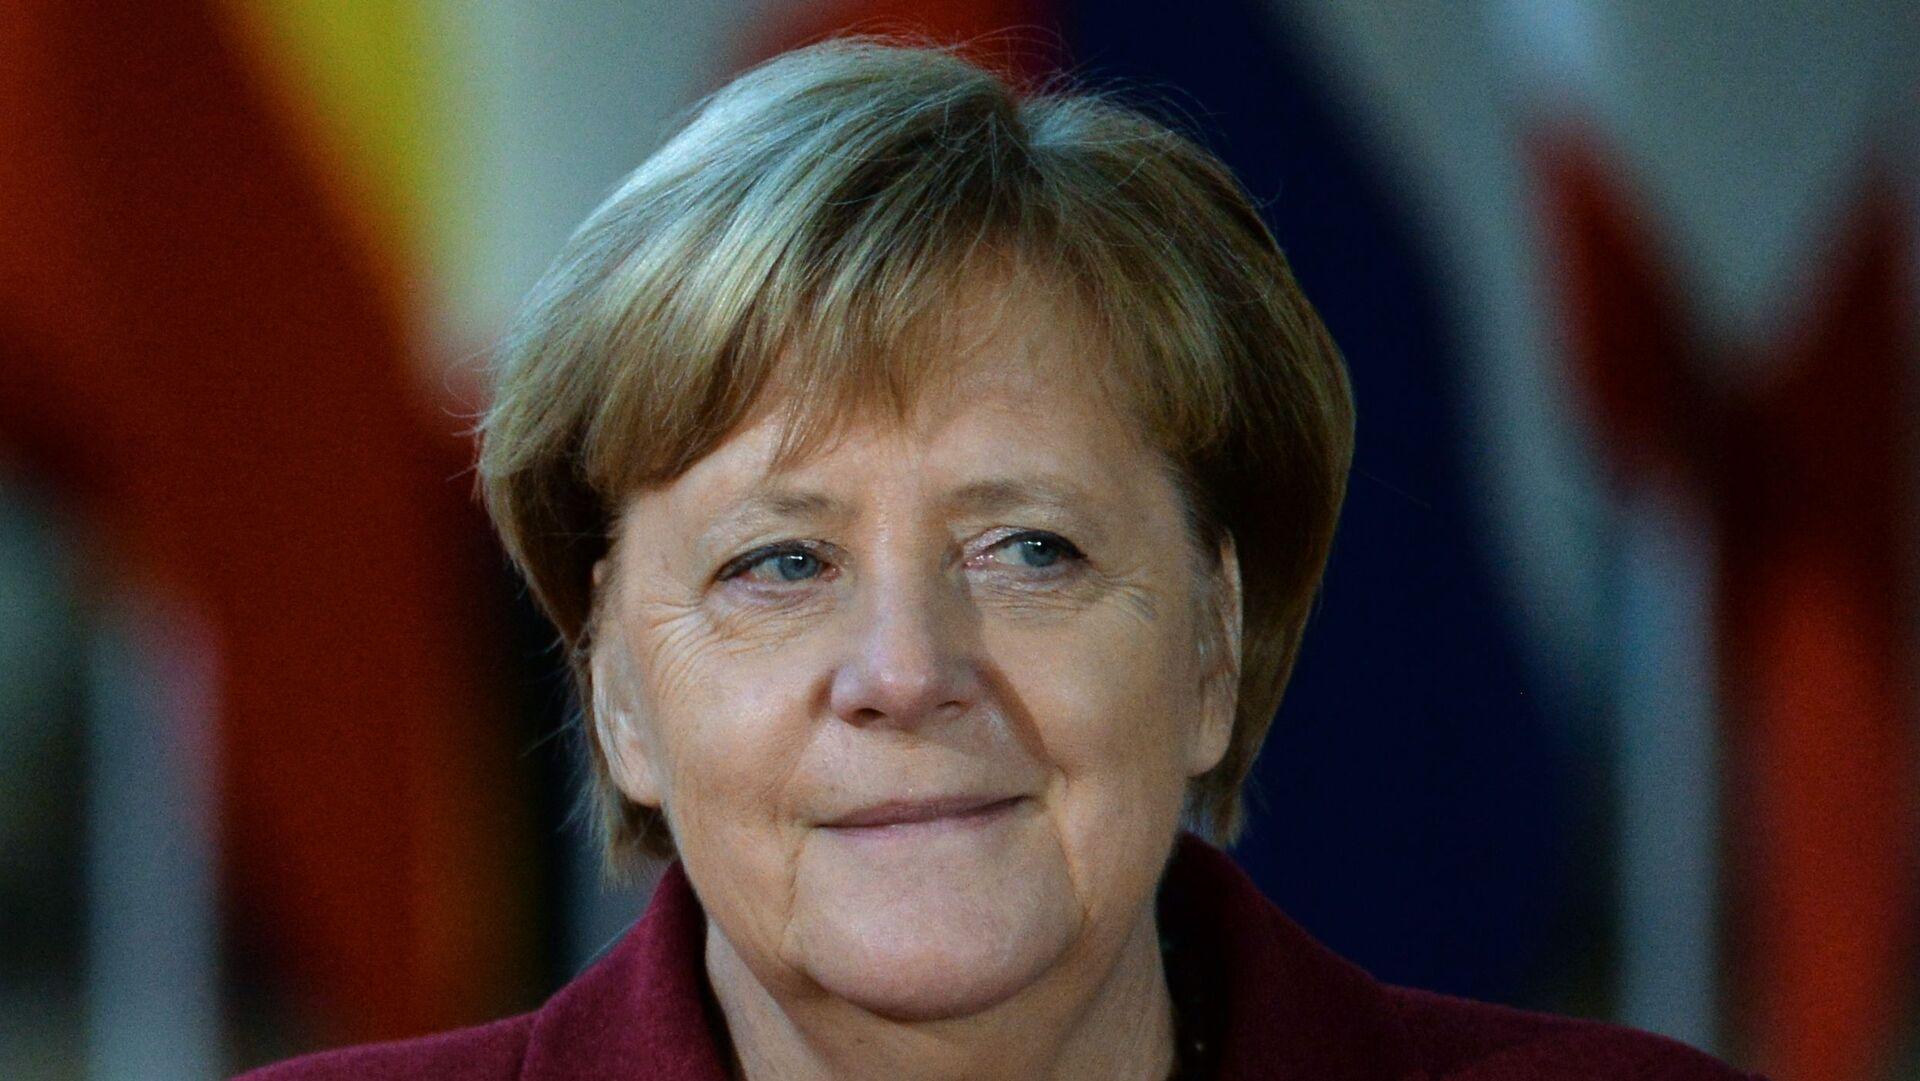 Kanclerz Niemiec Angela Merkel - Sputnik Polska, 1920, 25.06.2021